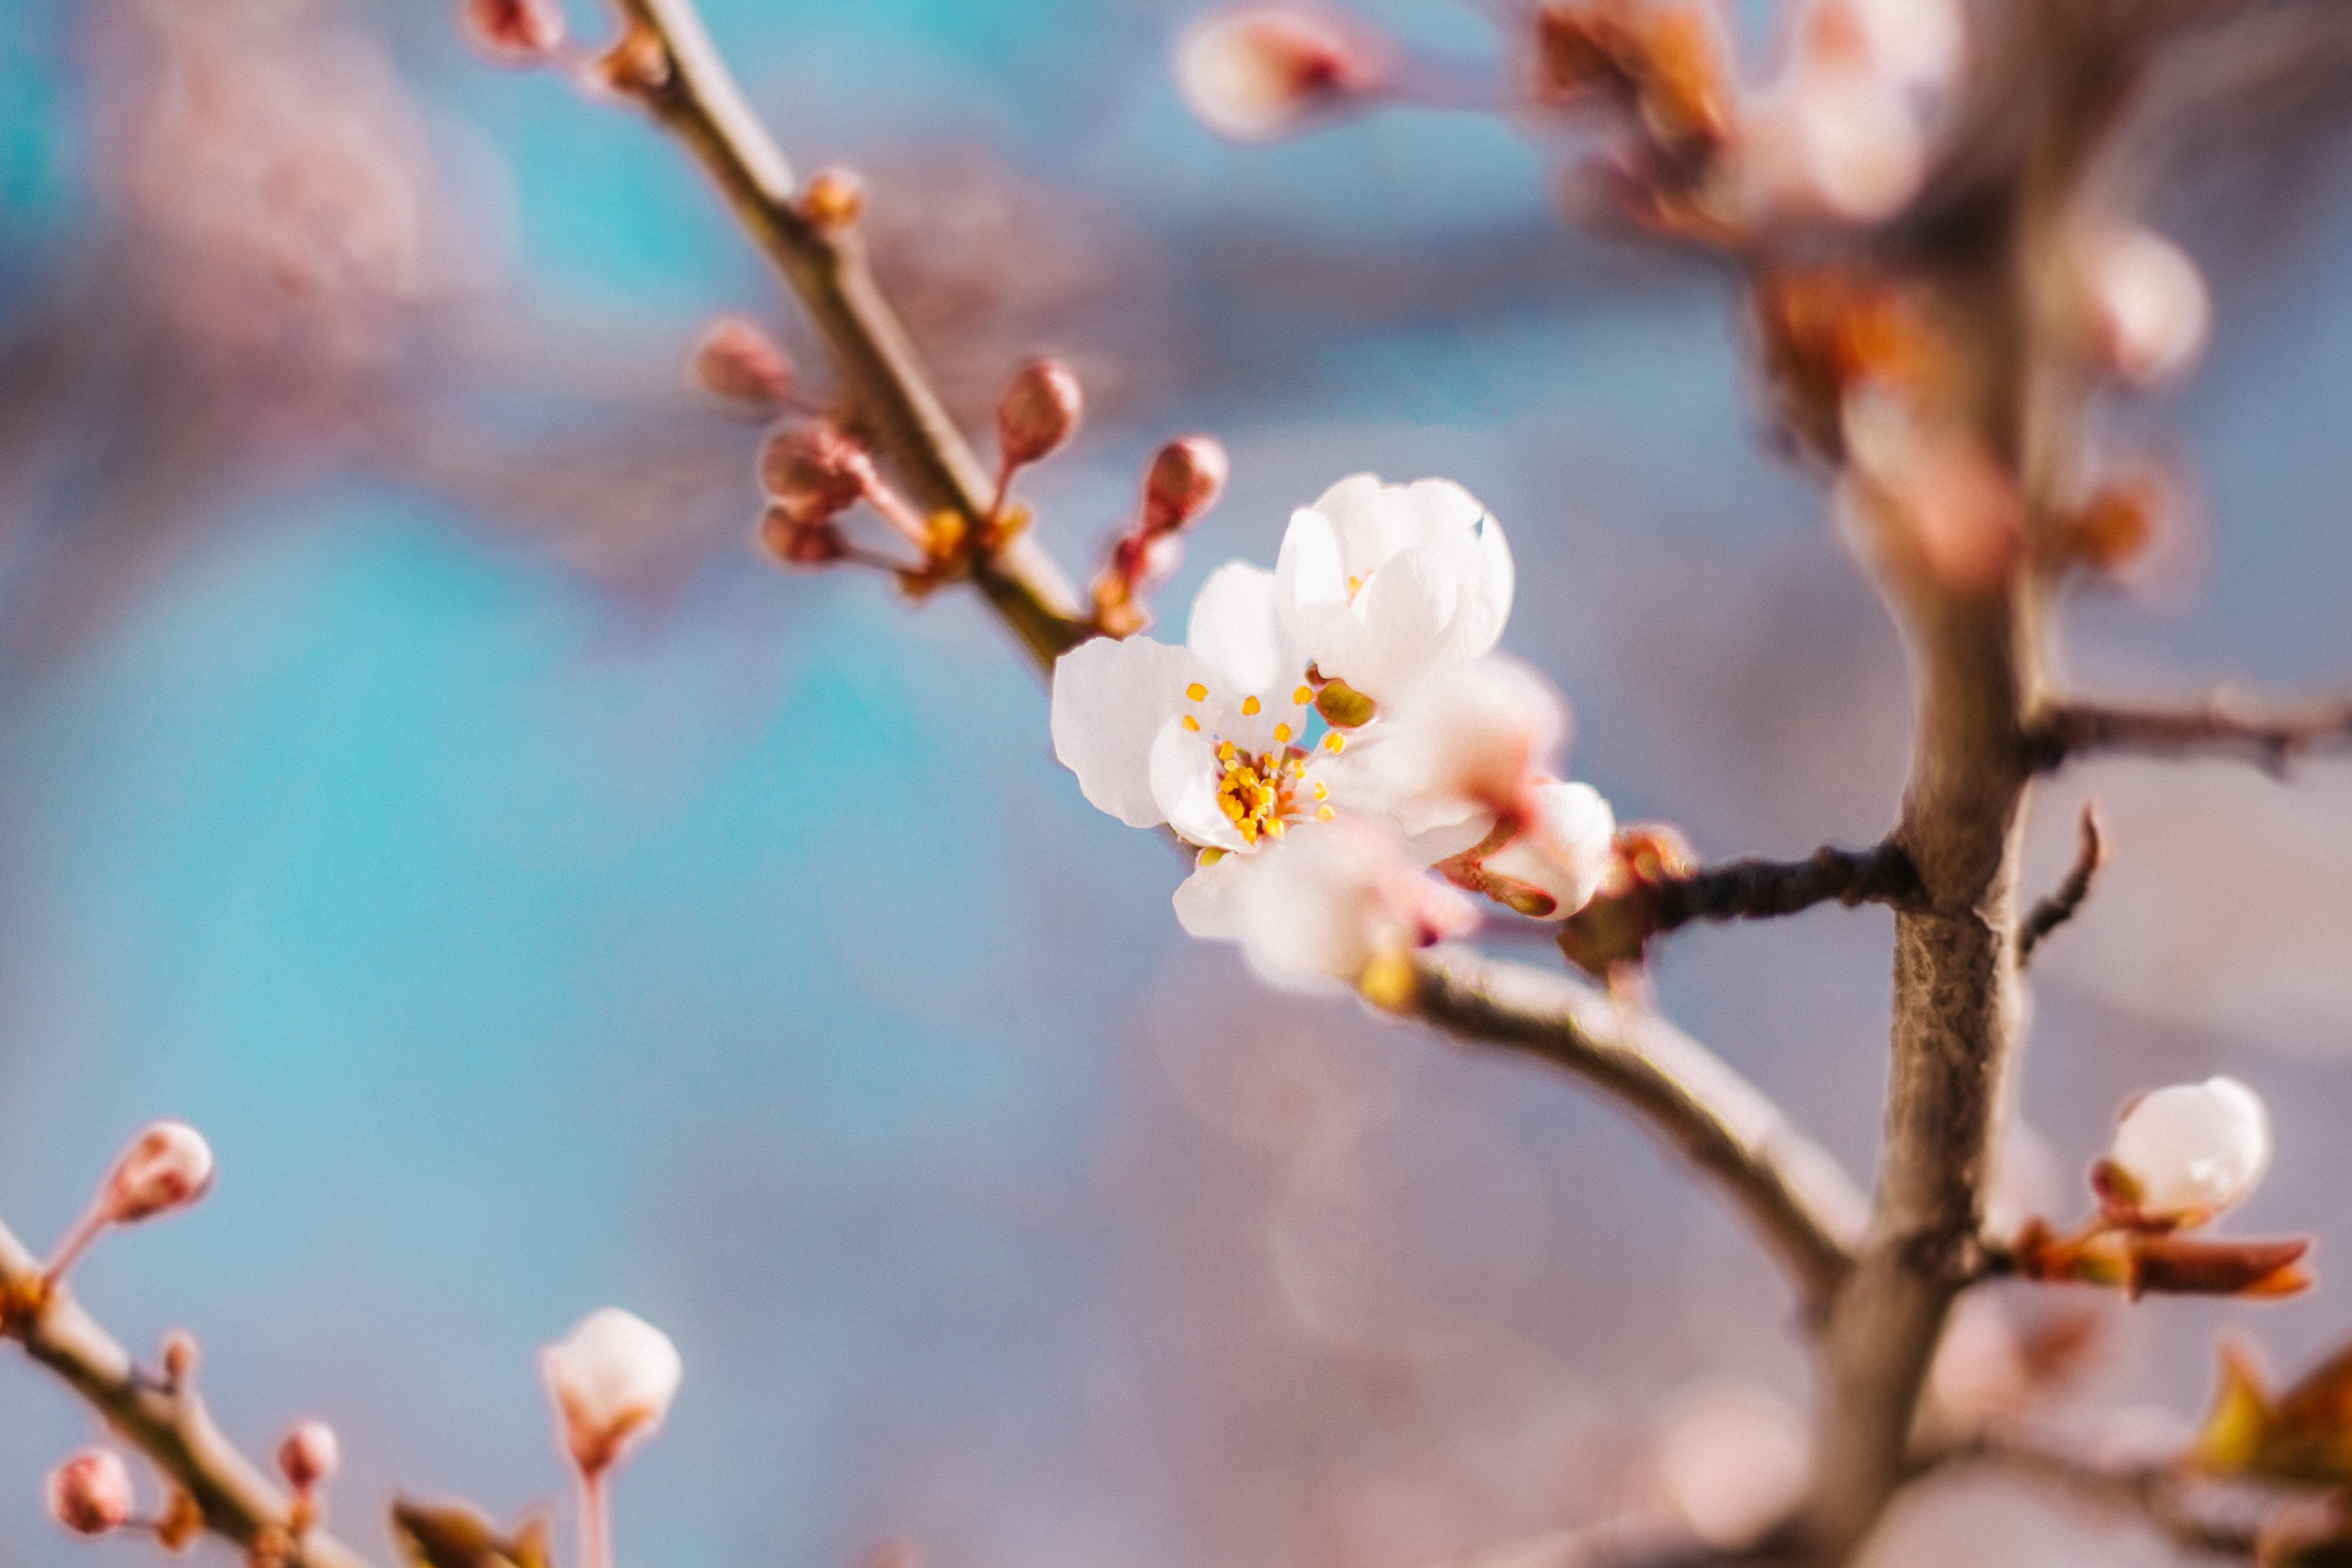 shallow shot of cherry blossom flower